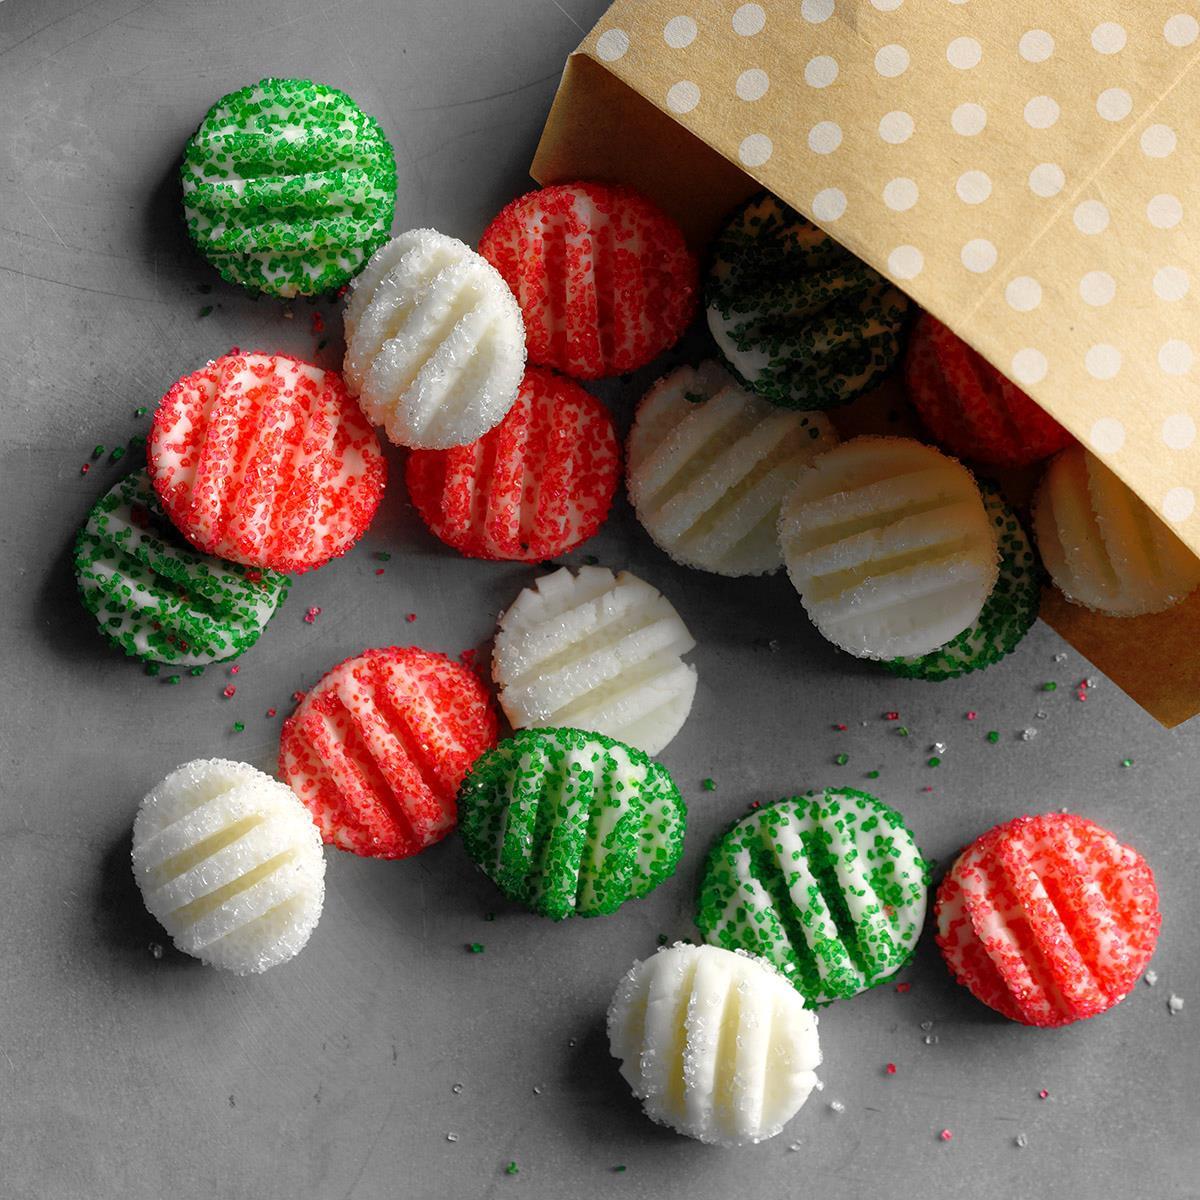 Christmas Candy Recipes  Top 10 Homemade Christmas Candy Recipes